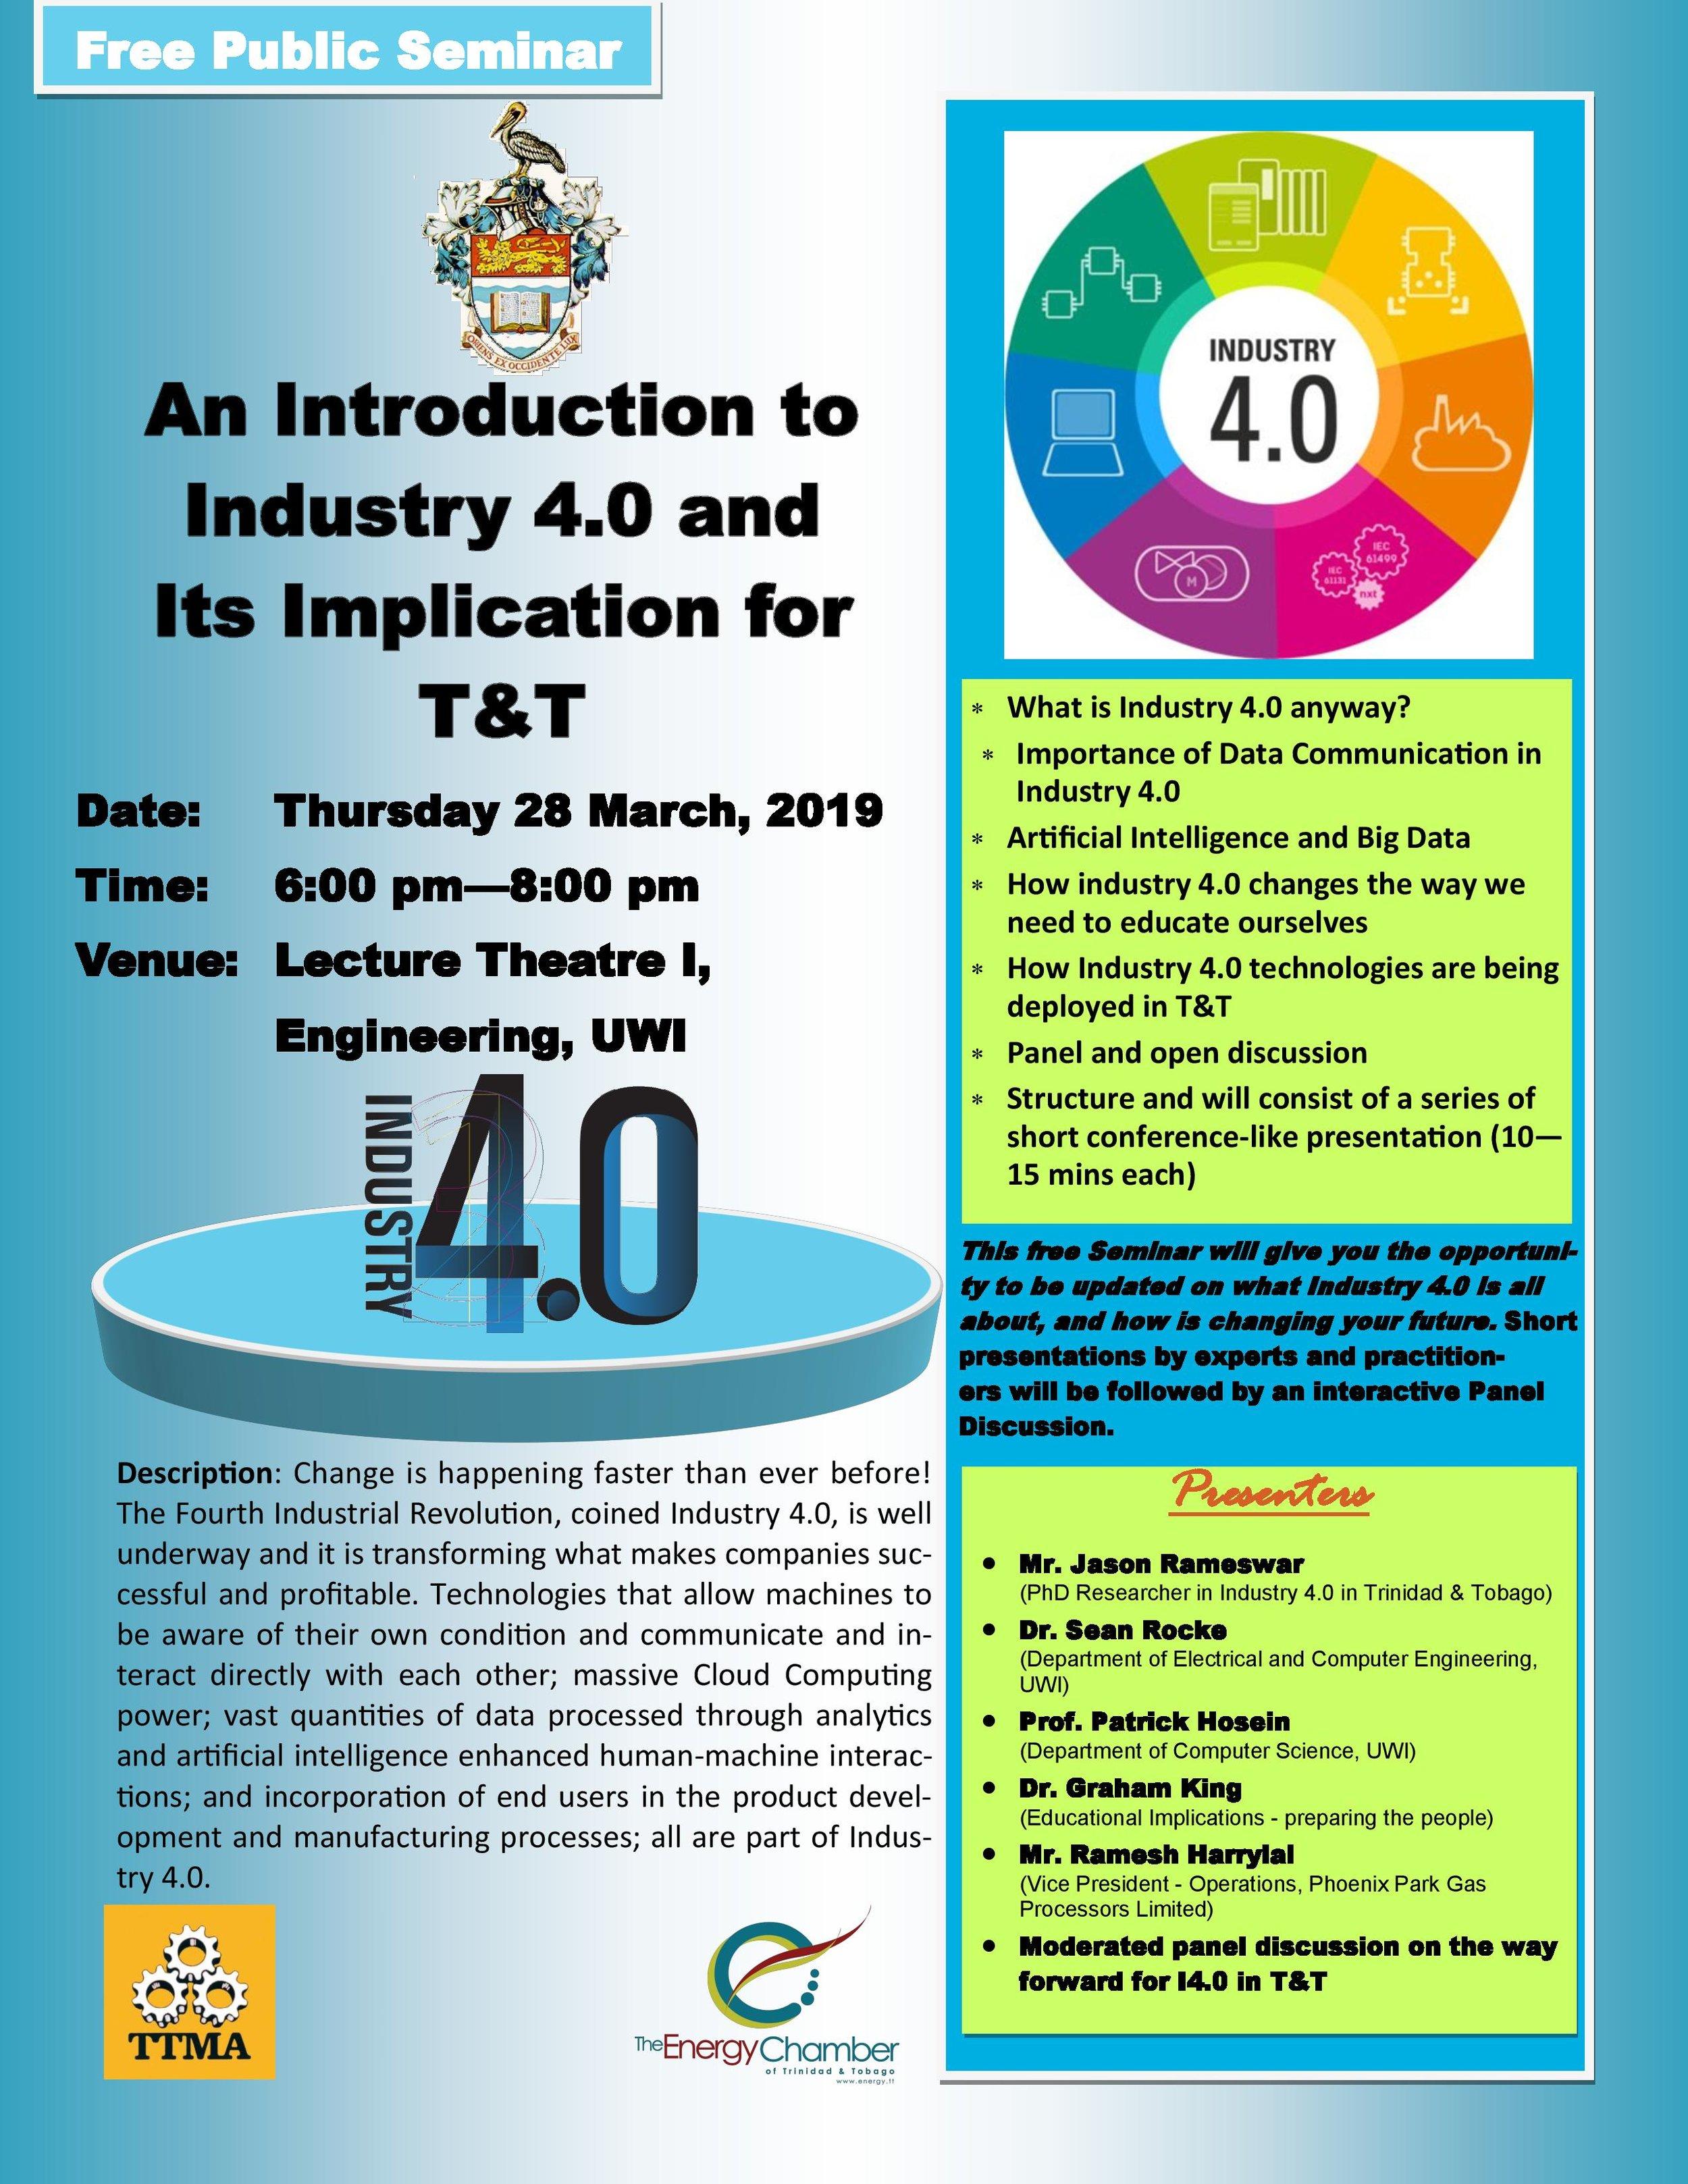 Industry 4.0 - Free Public Seminar-page-001.jpg